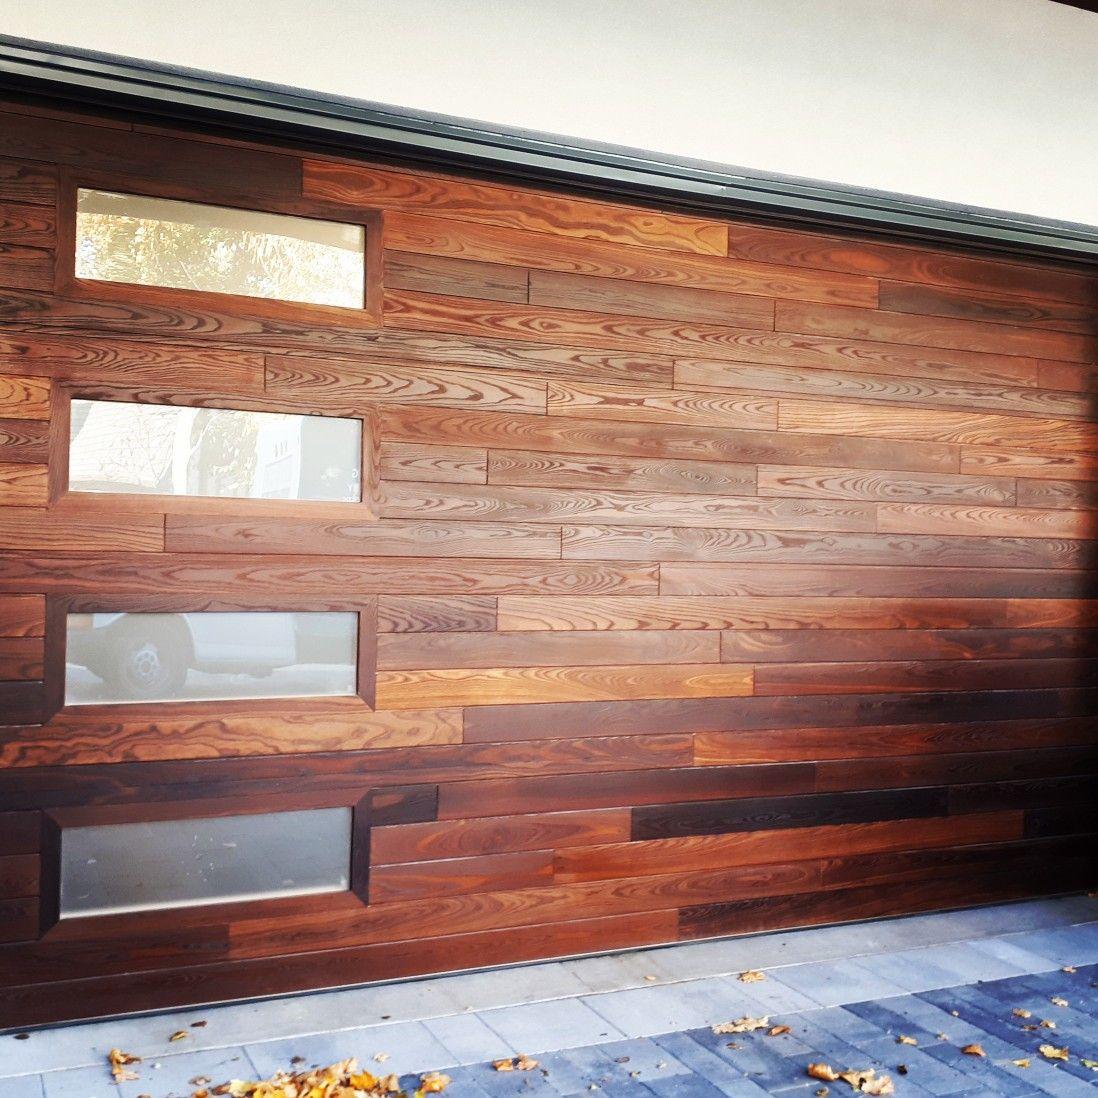 Dressing Up The Garage Door Thermallymodified Wooddoors Garage